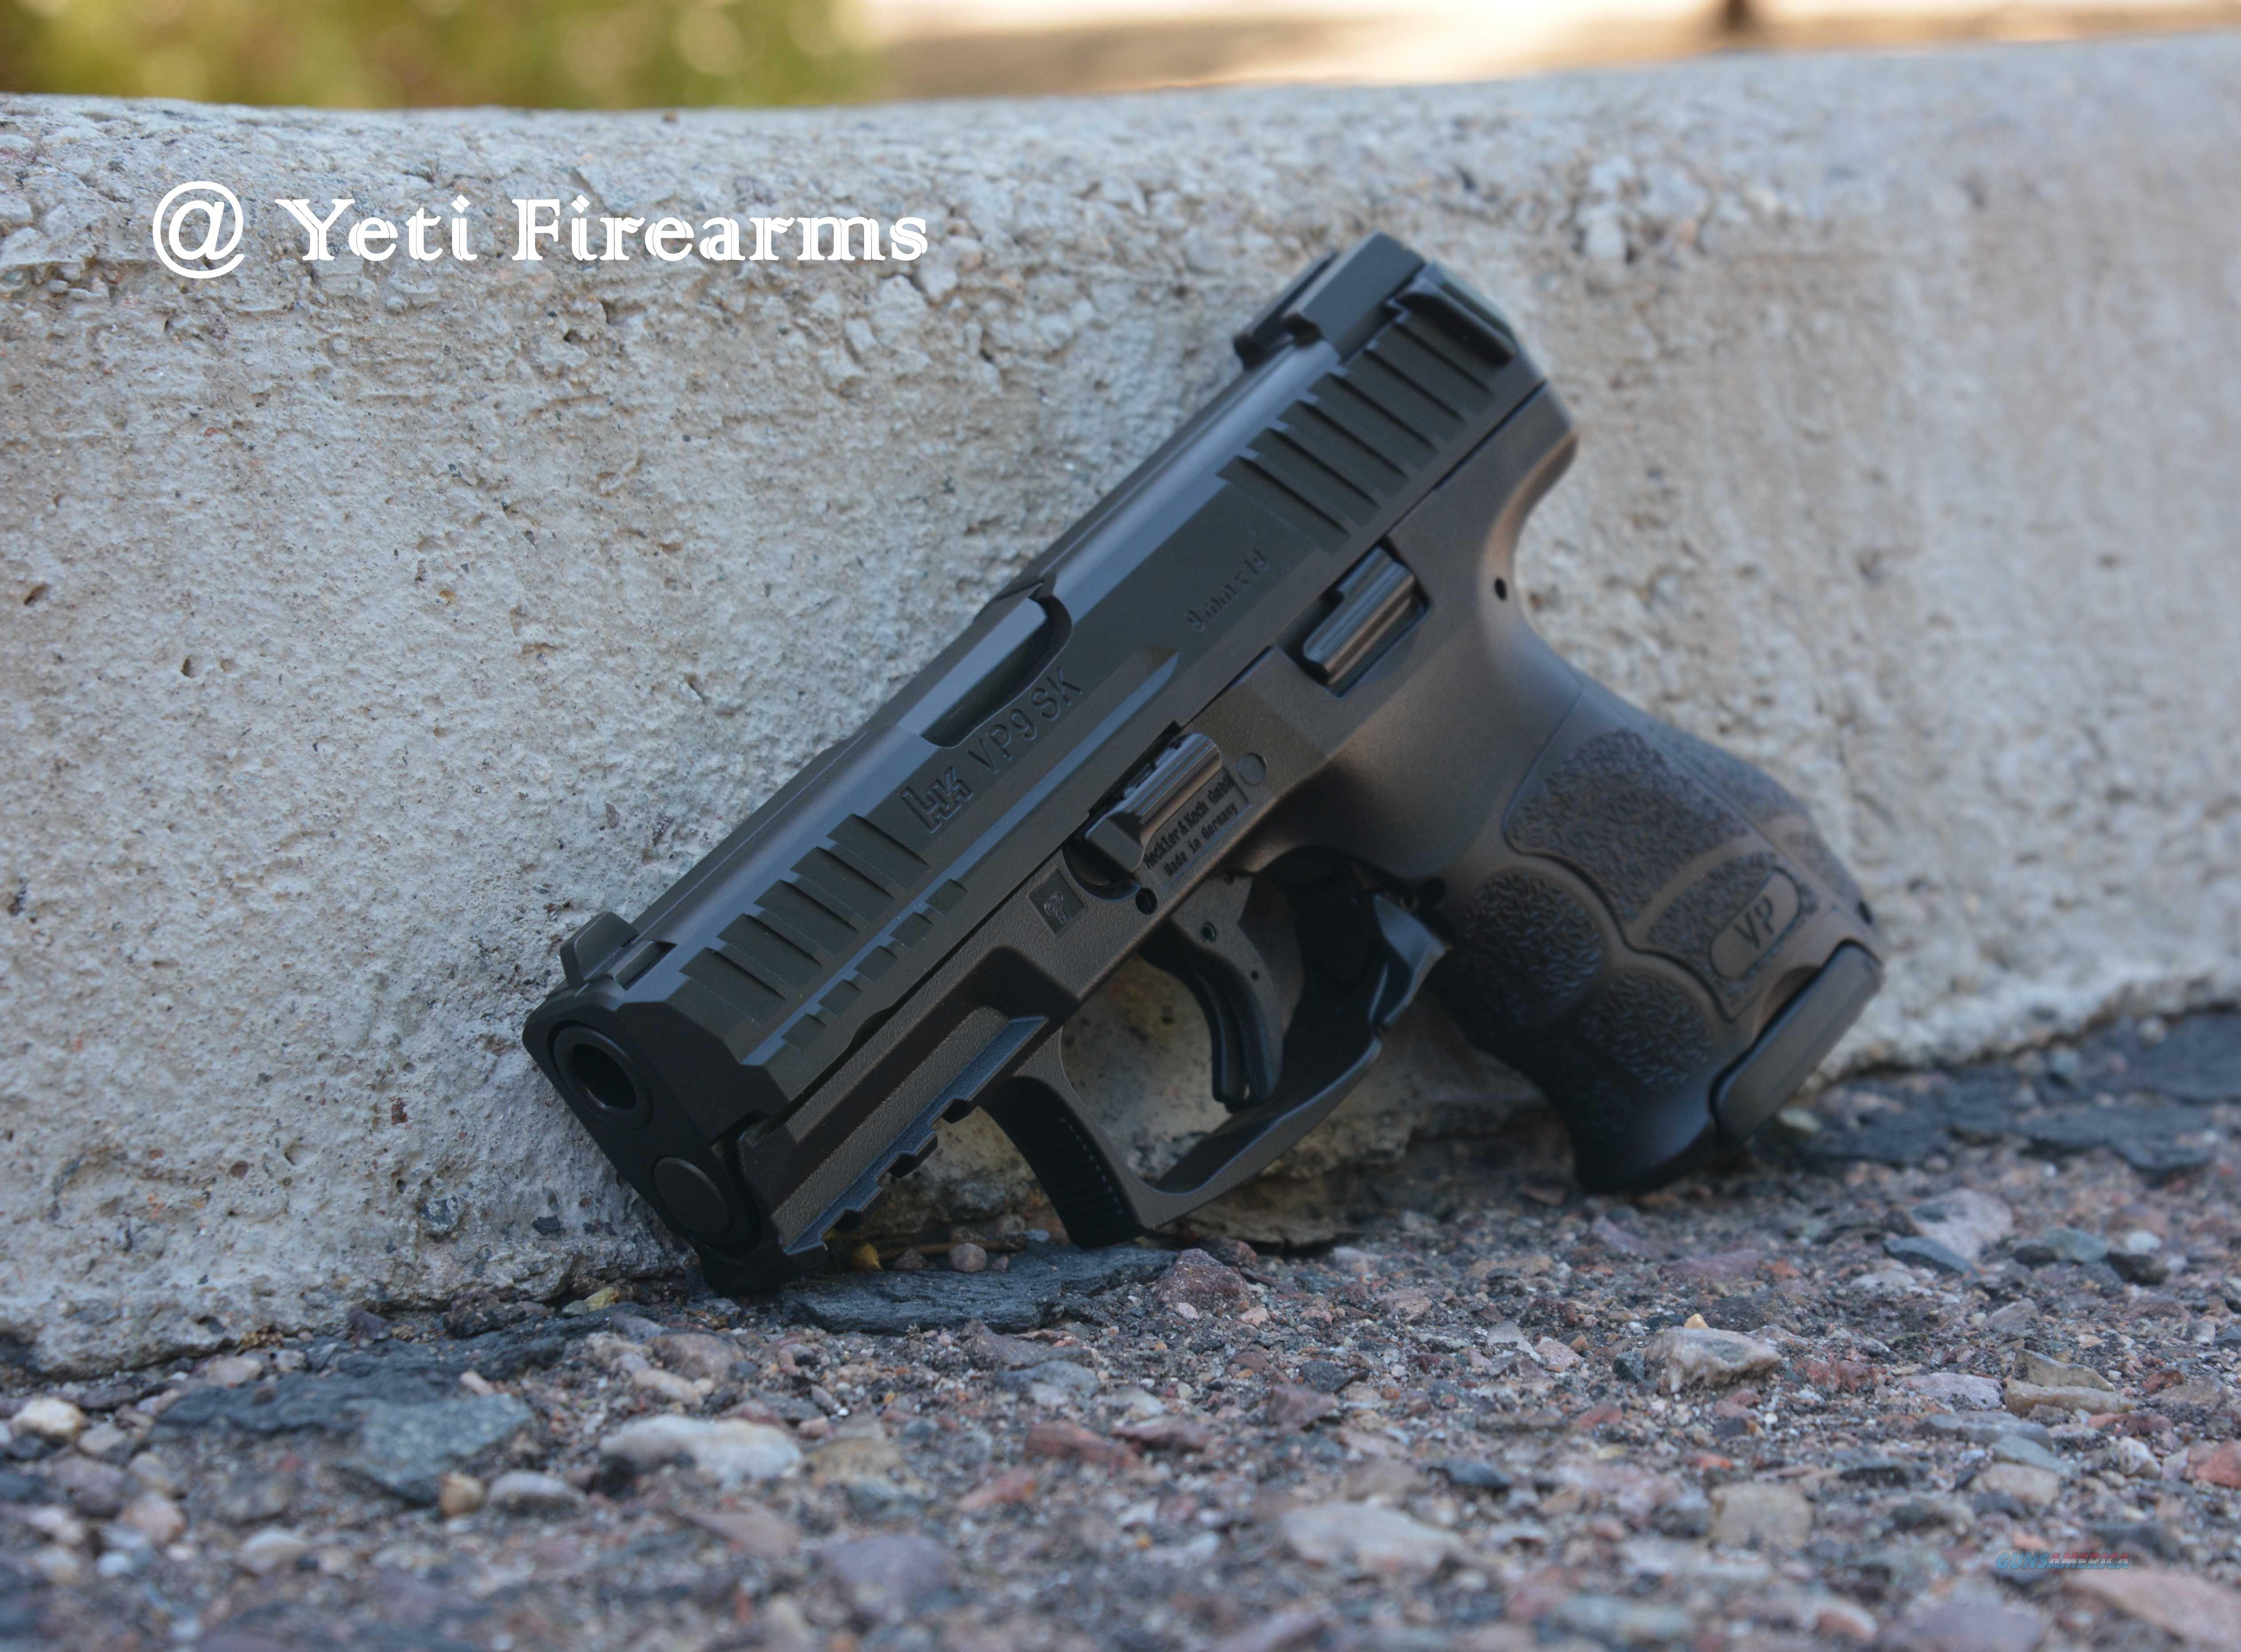 HK VP9SK 9mm Compact NS VP9 SK 700009KLE-A5 H&K